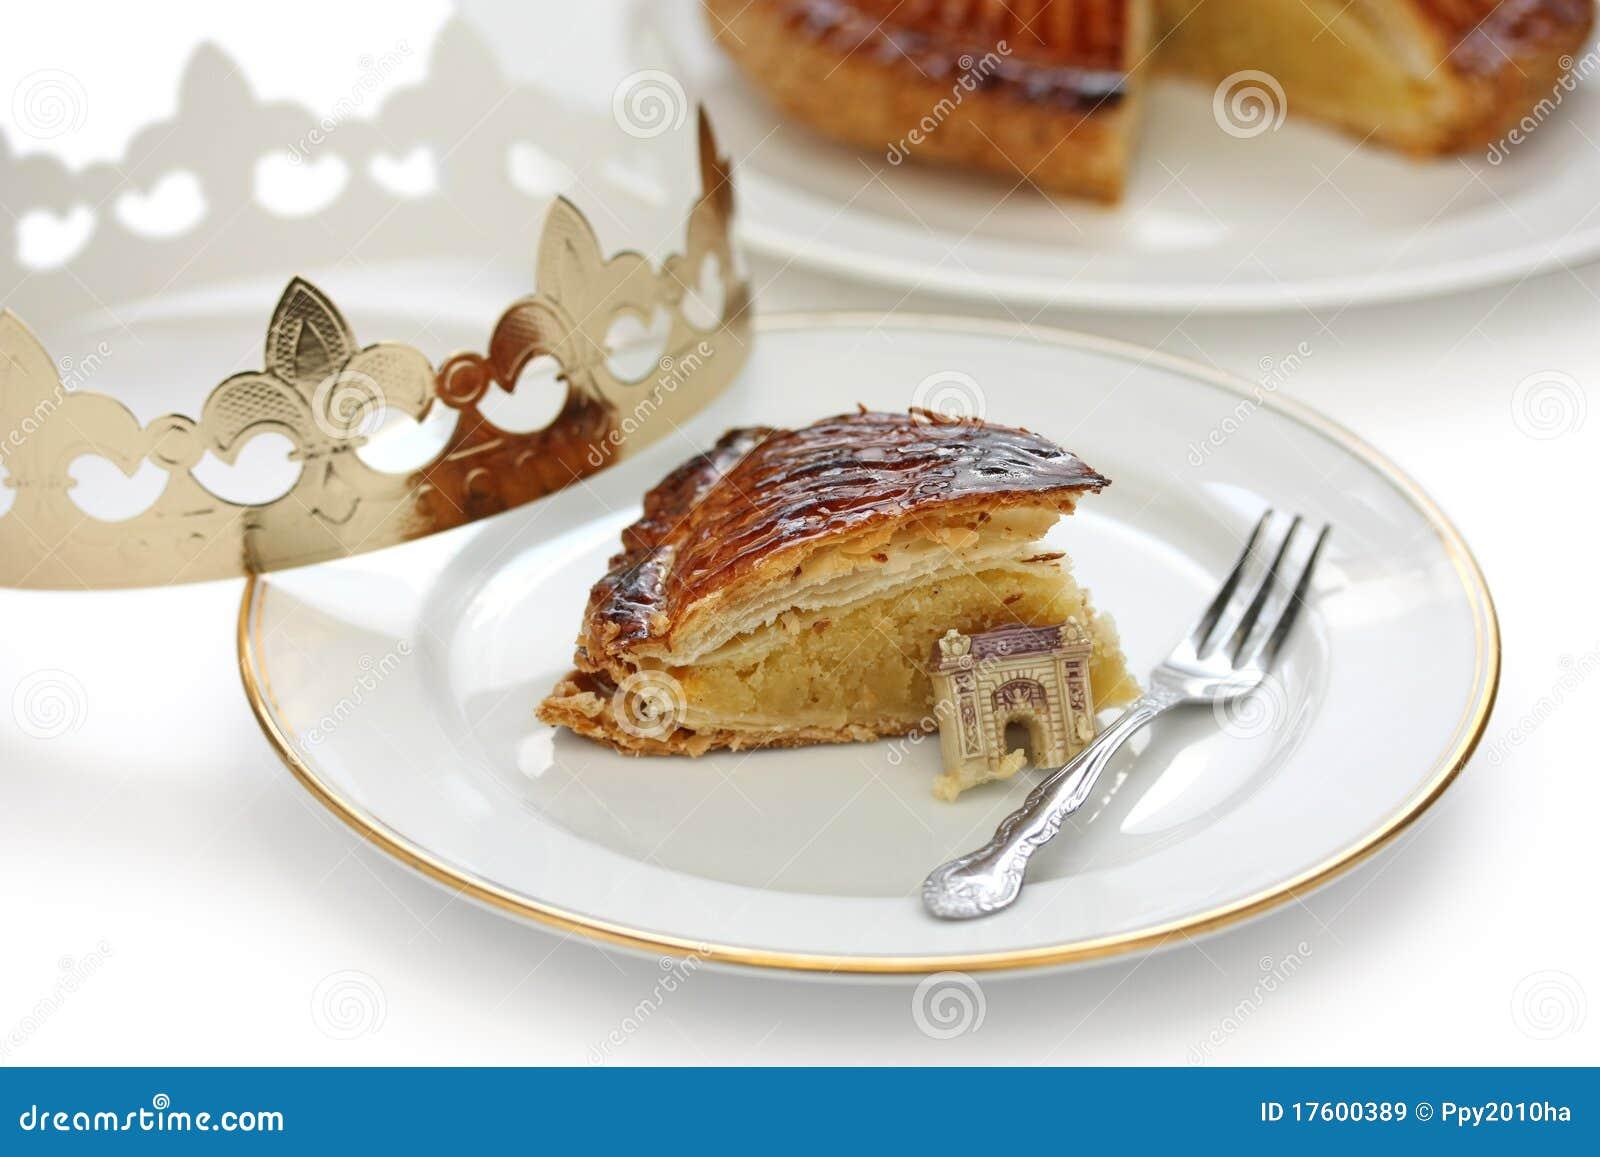 Galette des rois king cake royalty free stock images for Galette des rois decoration